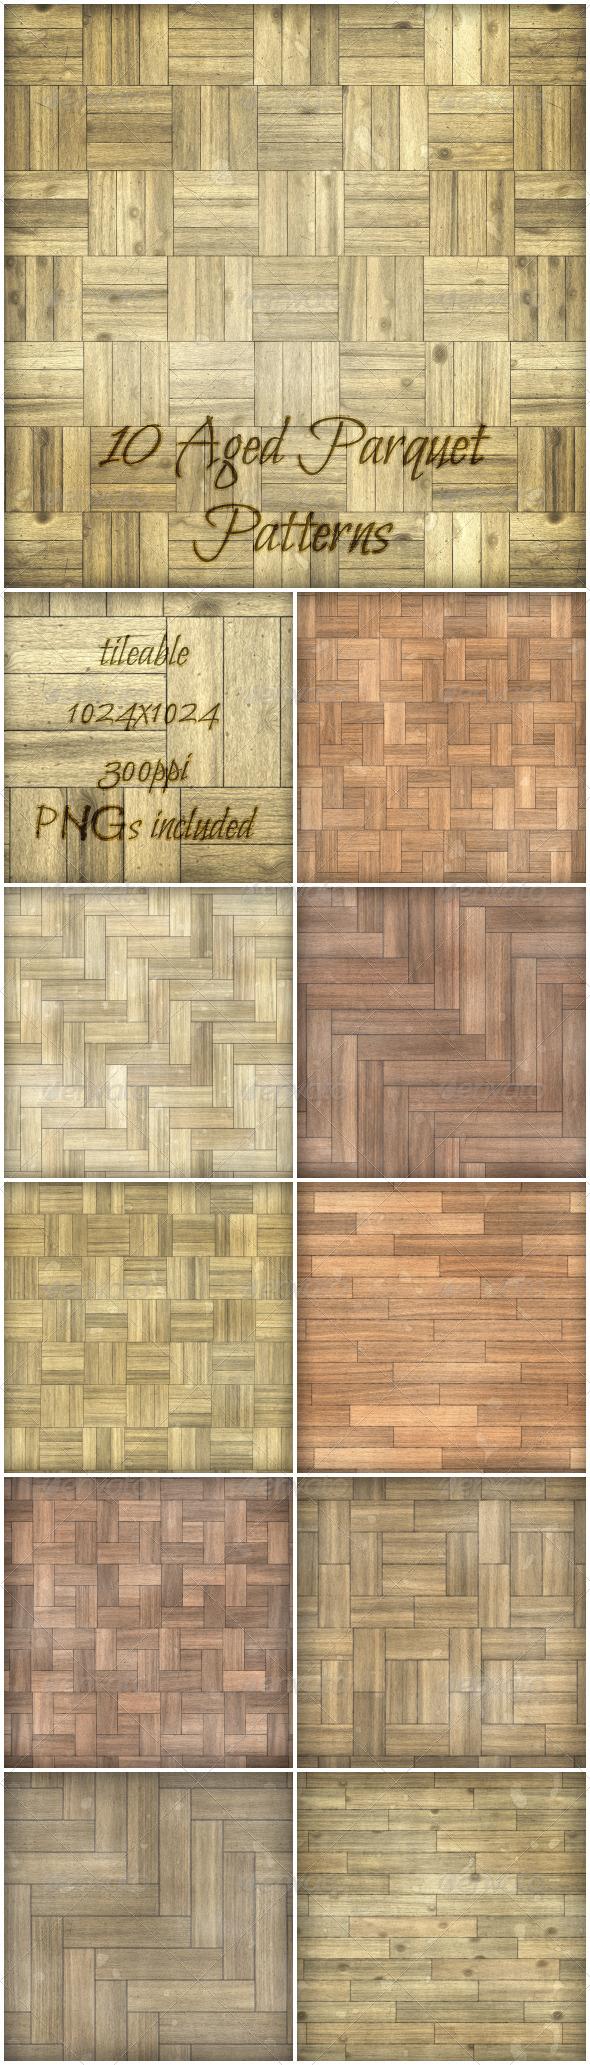 GraphicRiver 10 Aged Parquet Patterns 6333735